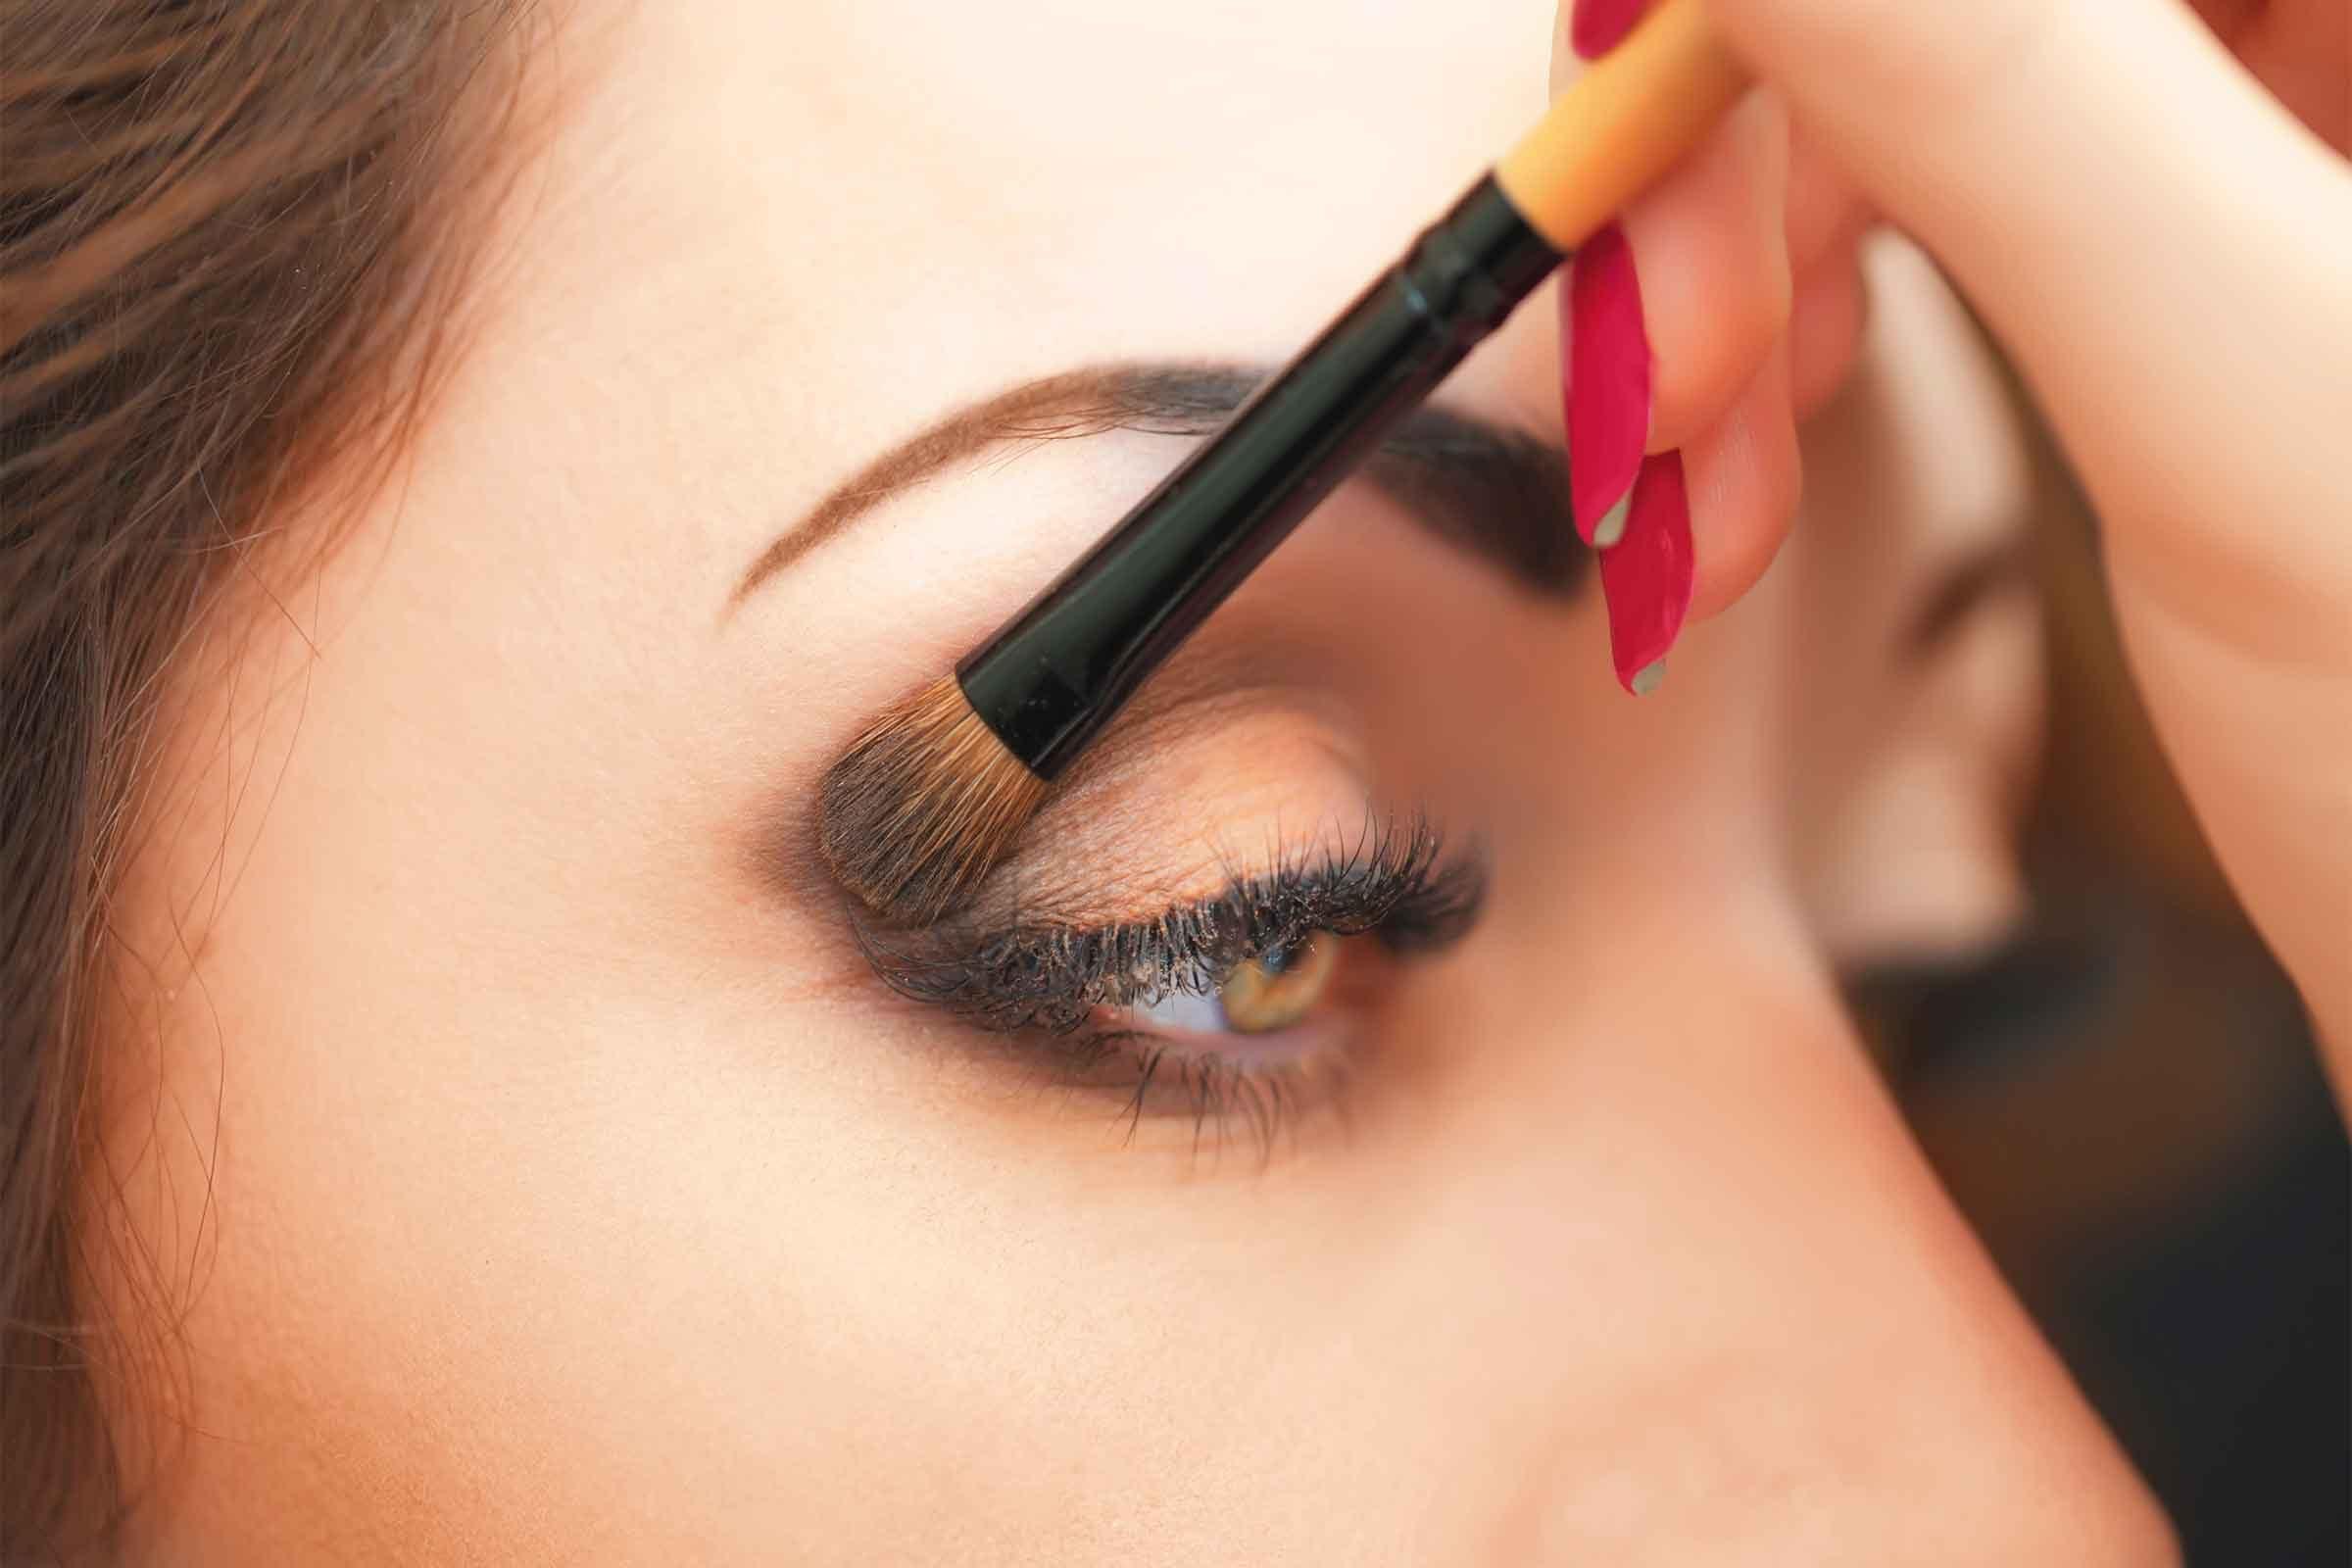 Eye Makeup Tips 7 Ways to Make Your Eyes Pop  Readers Digest